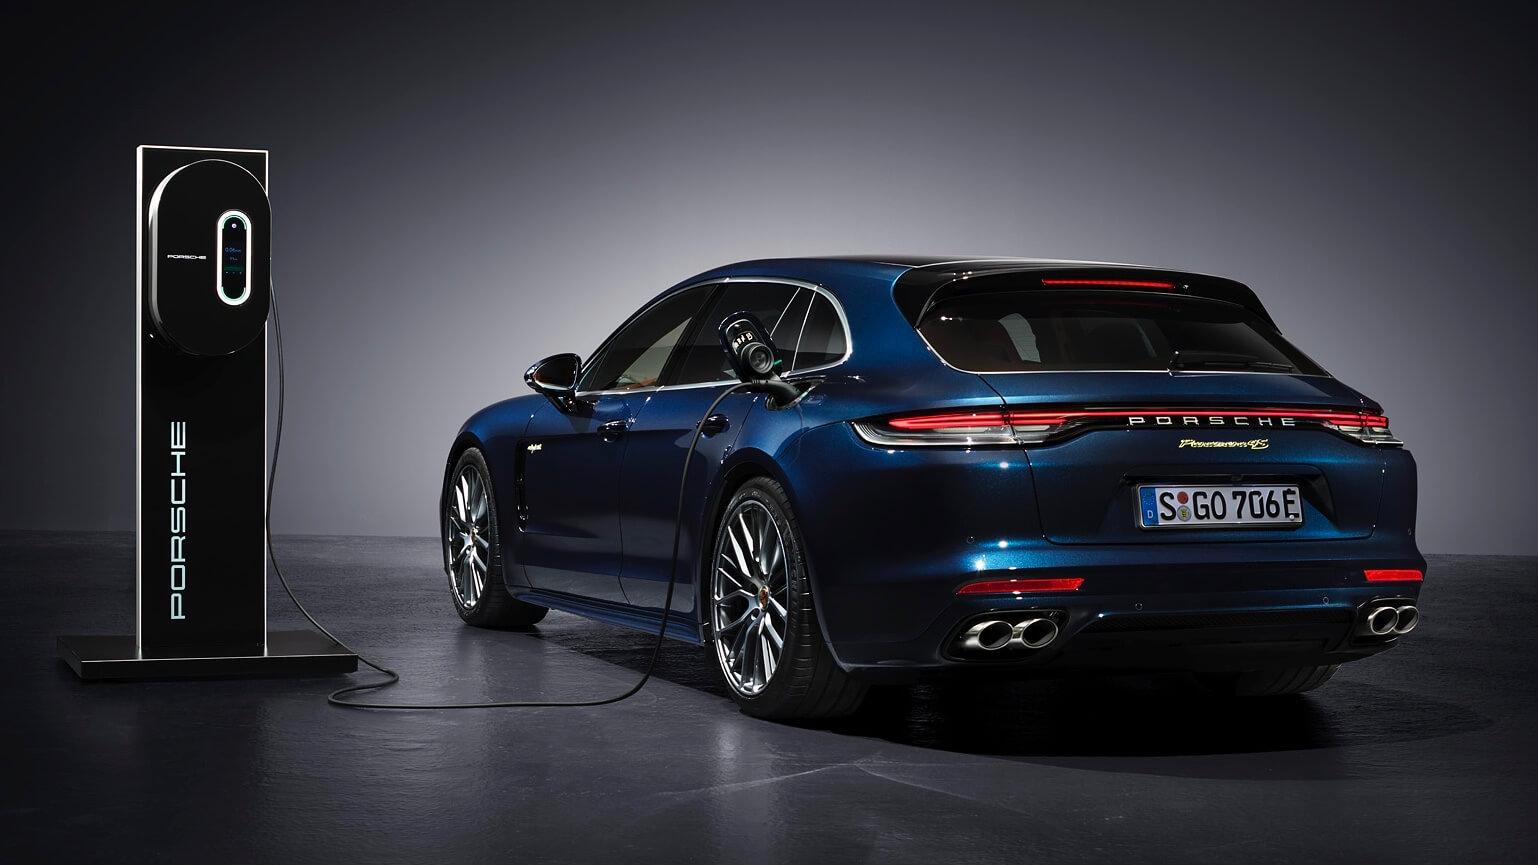 Porsche Panamera 4S E Hybrid Sport Turismo